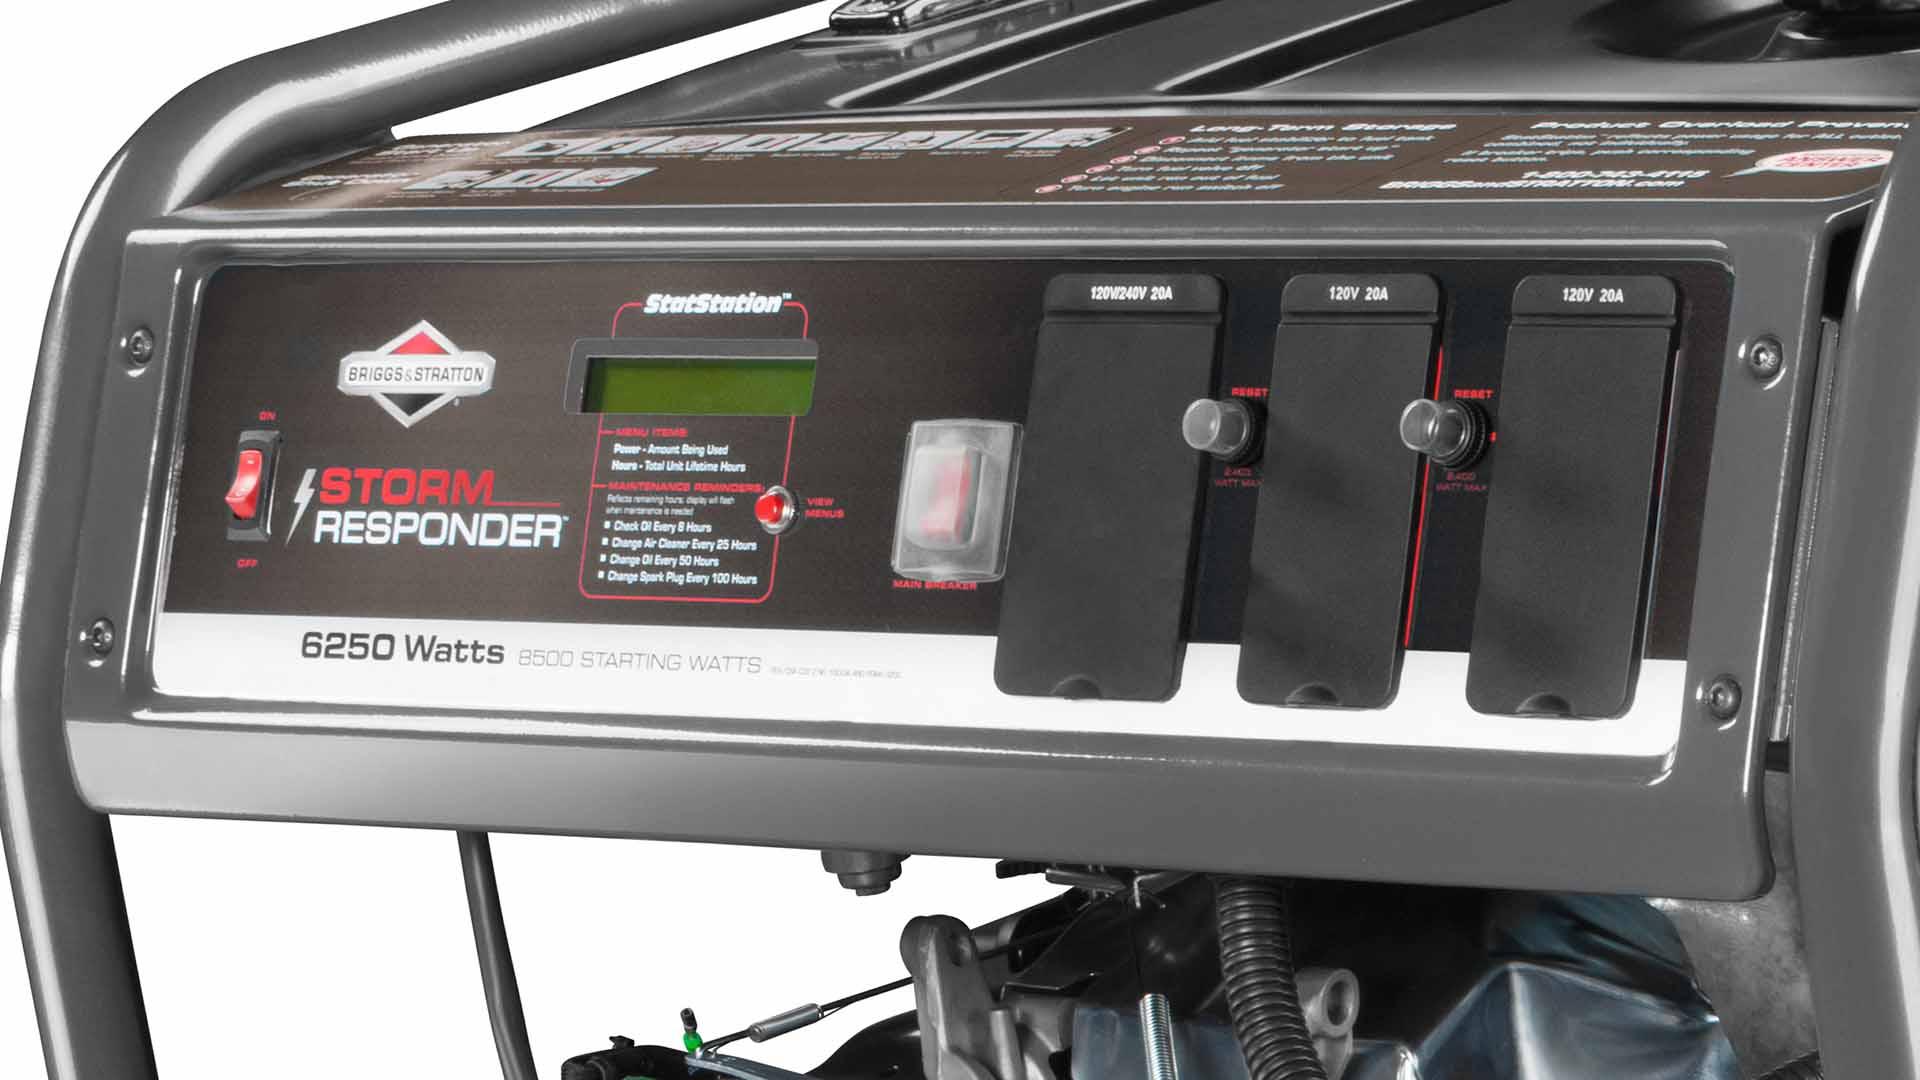 Multi-Featured Control Panel